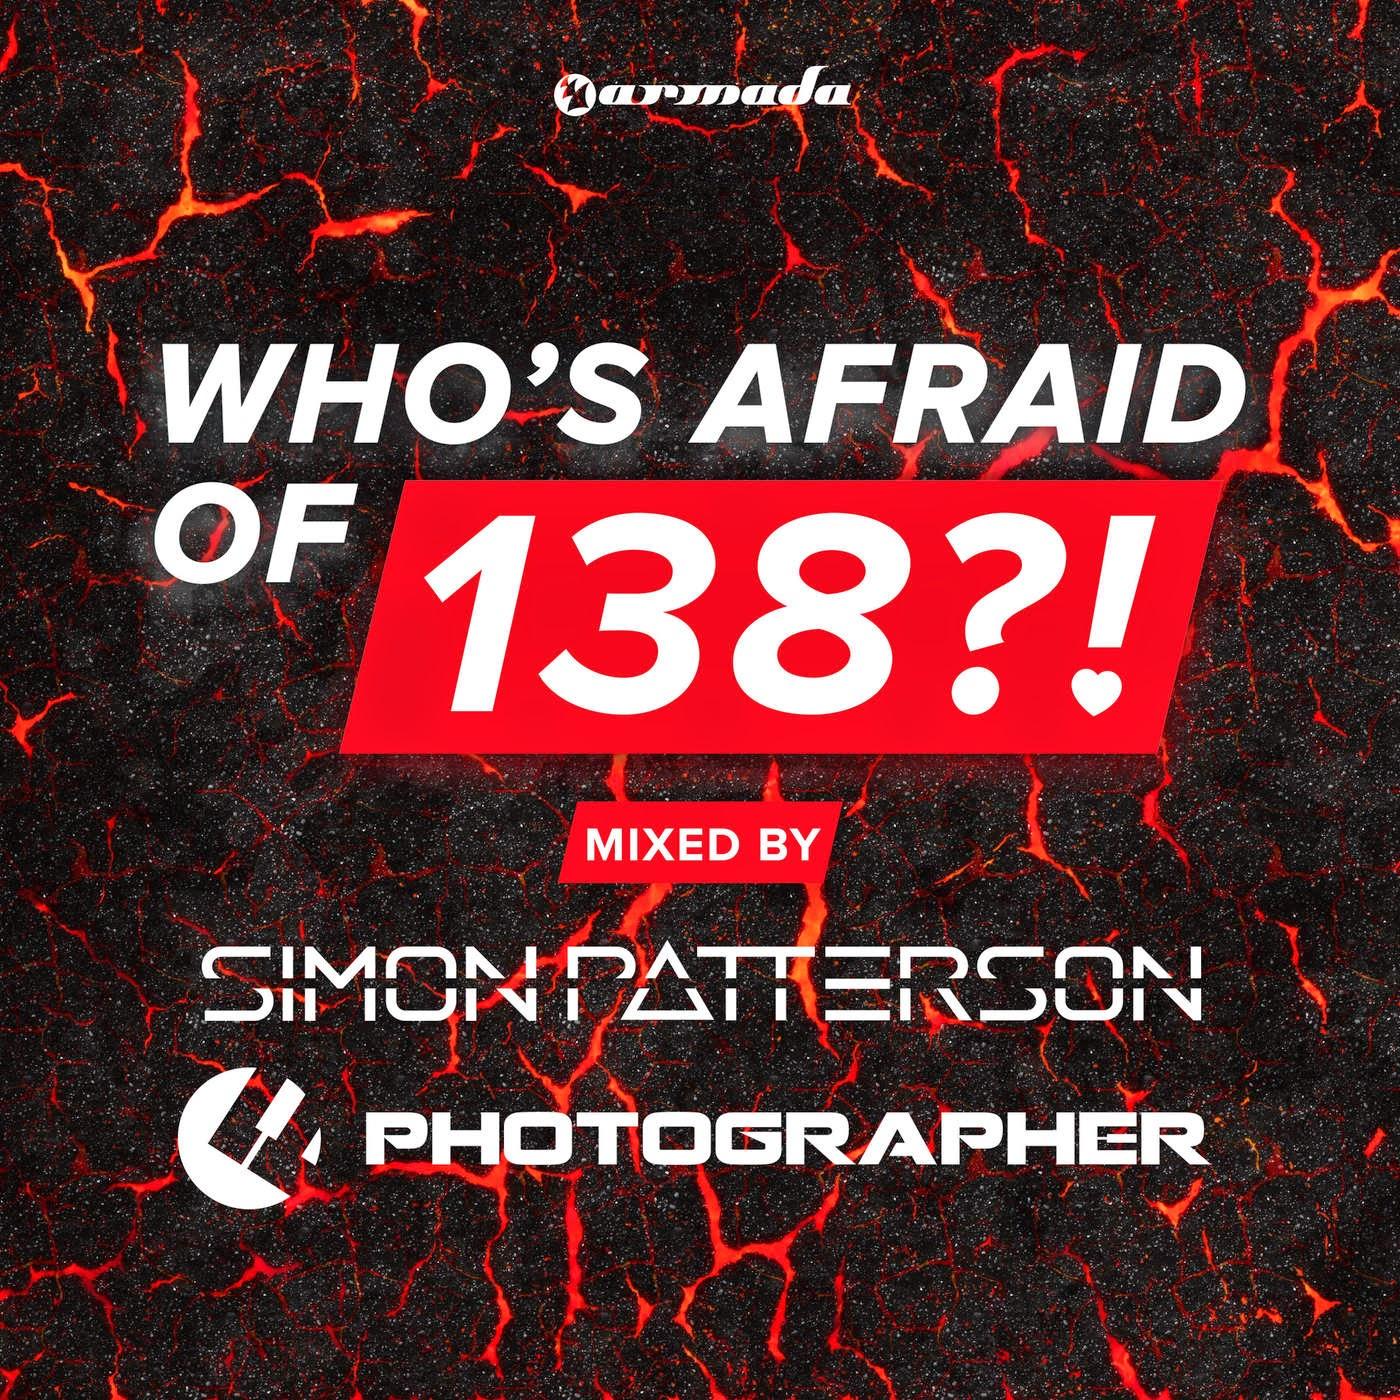 Simon Patterson & Photographer - Who's Afraid of 138?! (Mixed by Simon Patterson & Photographer) Cover